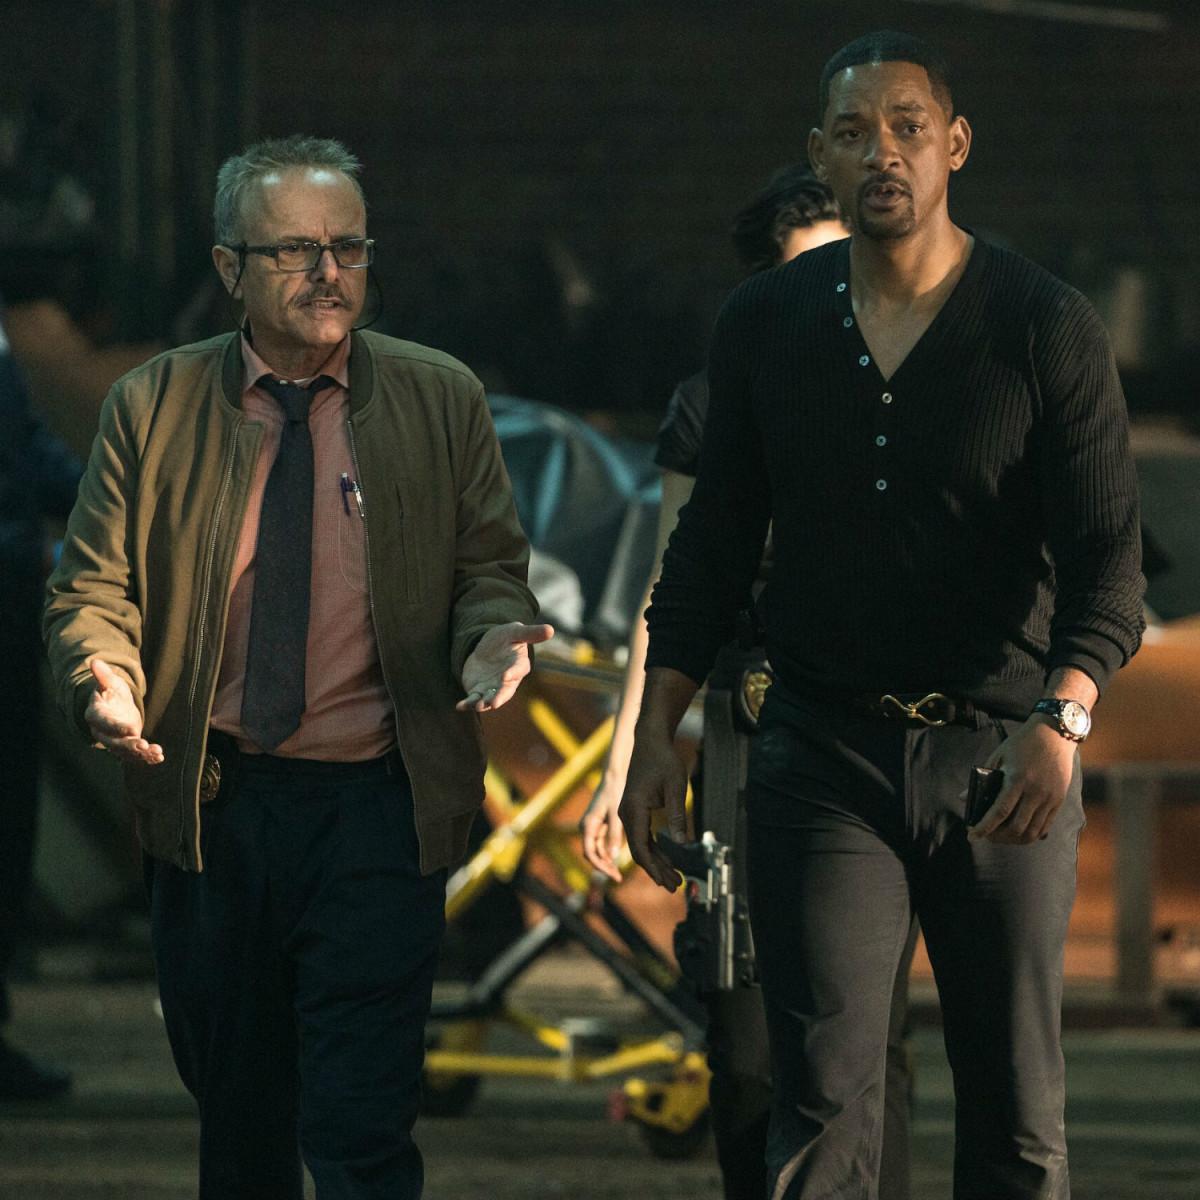 Joe Pantoliano and Will Smith in Bad Boys for Life